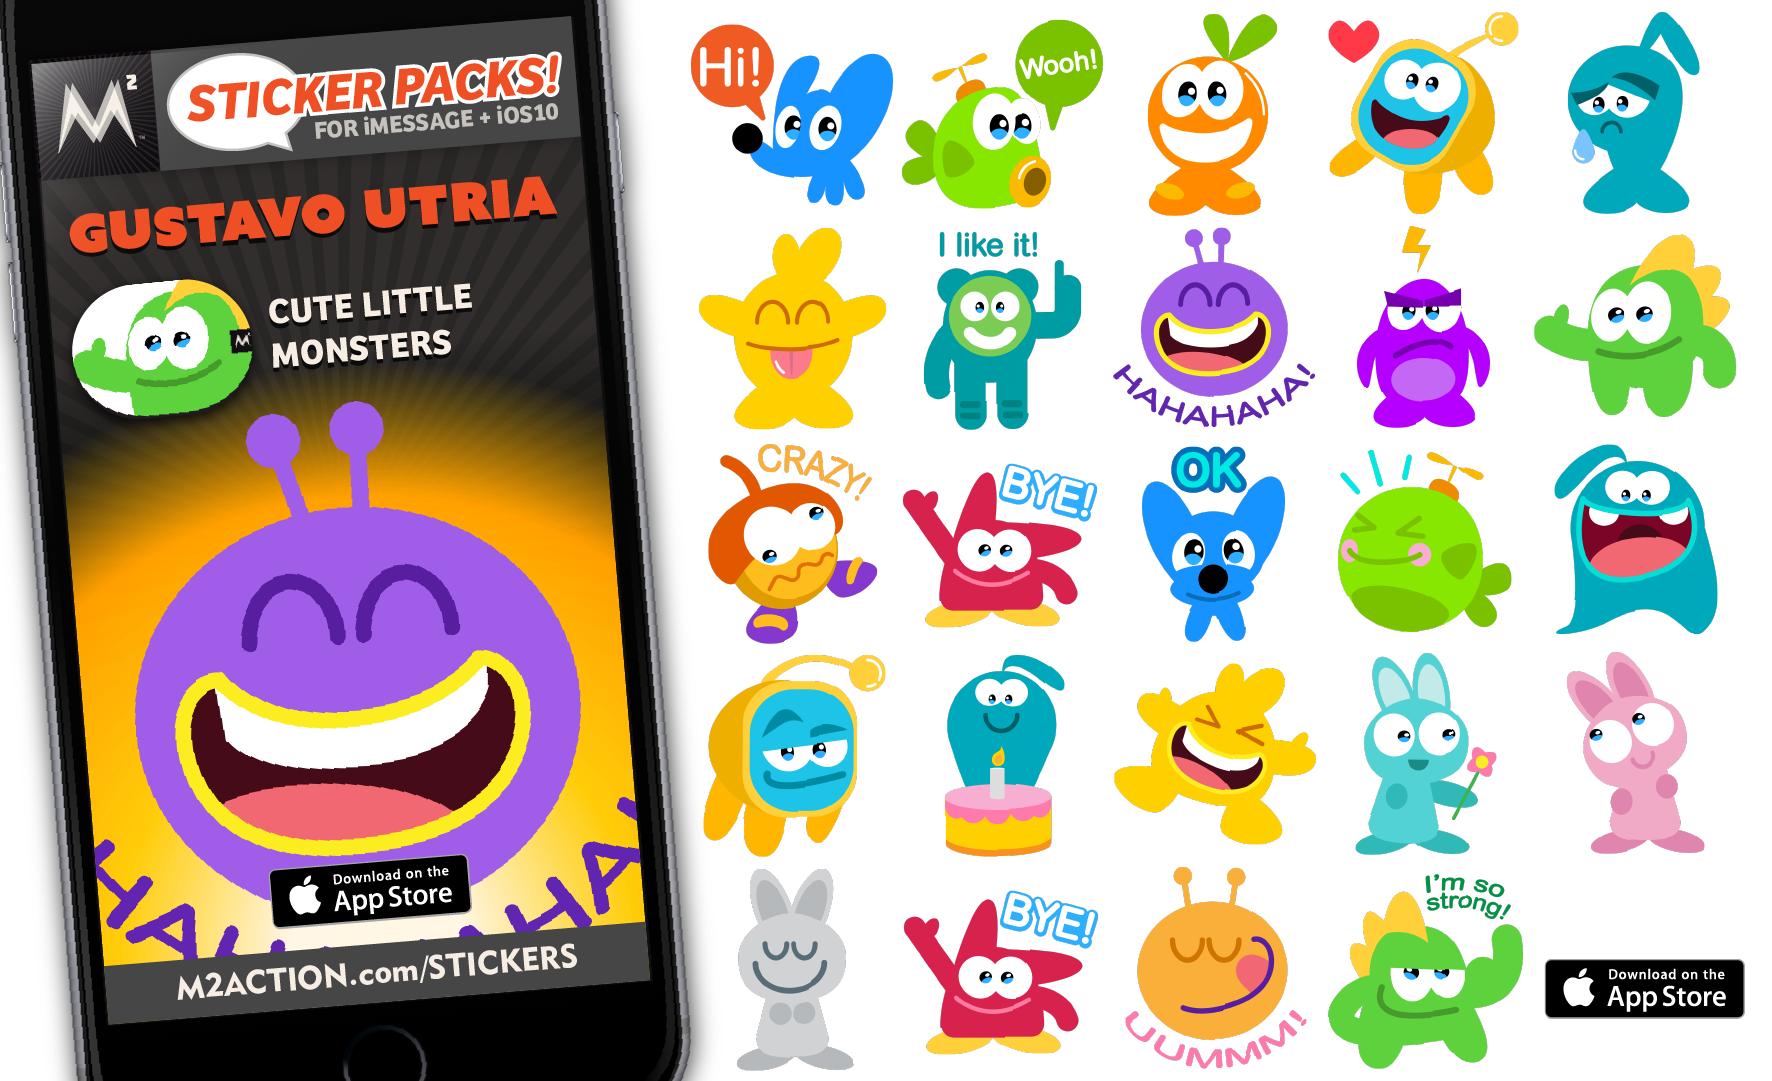 M2_Stickers_Promos_Dec2016_GustavoUtria_CuteLittleMonsters.png